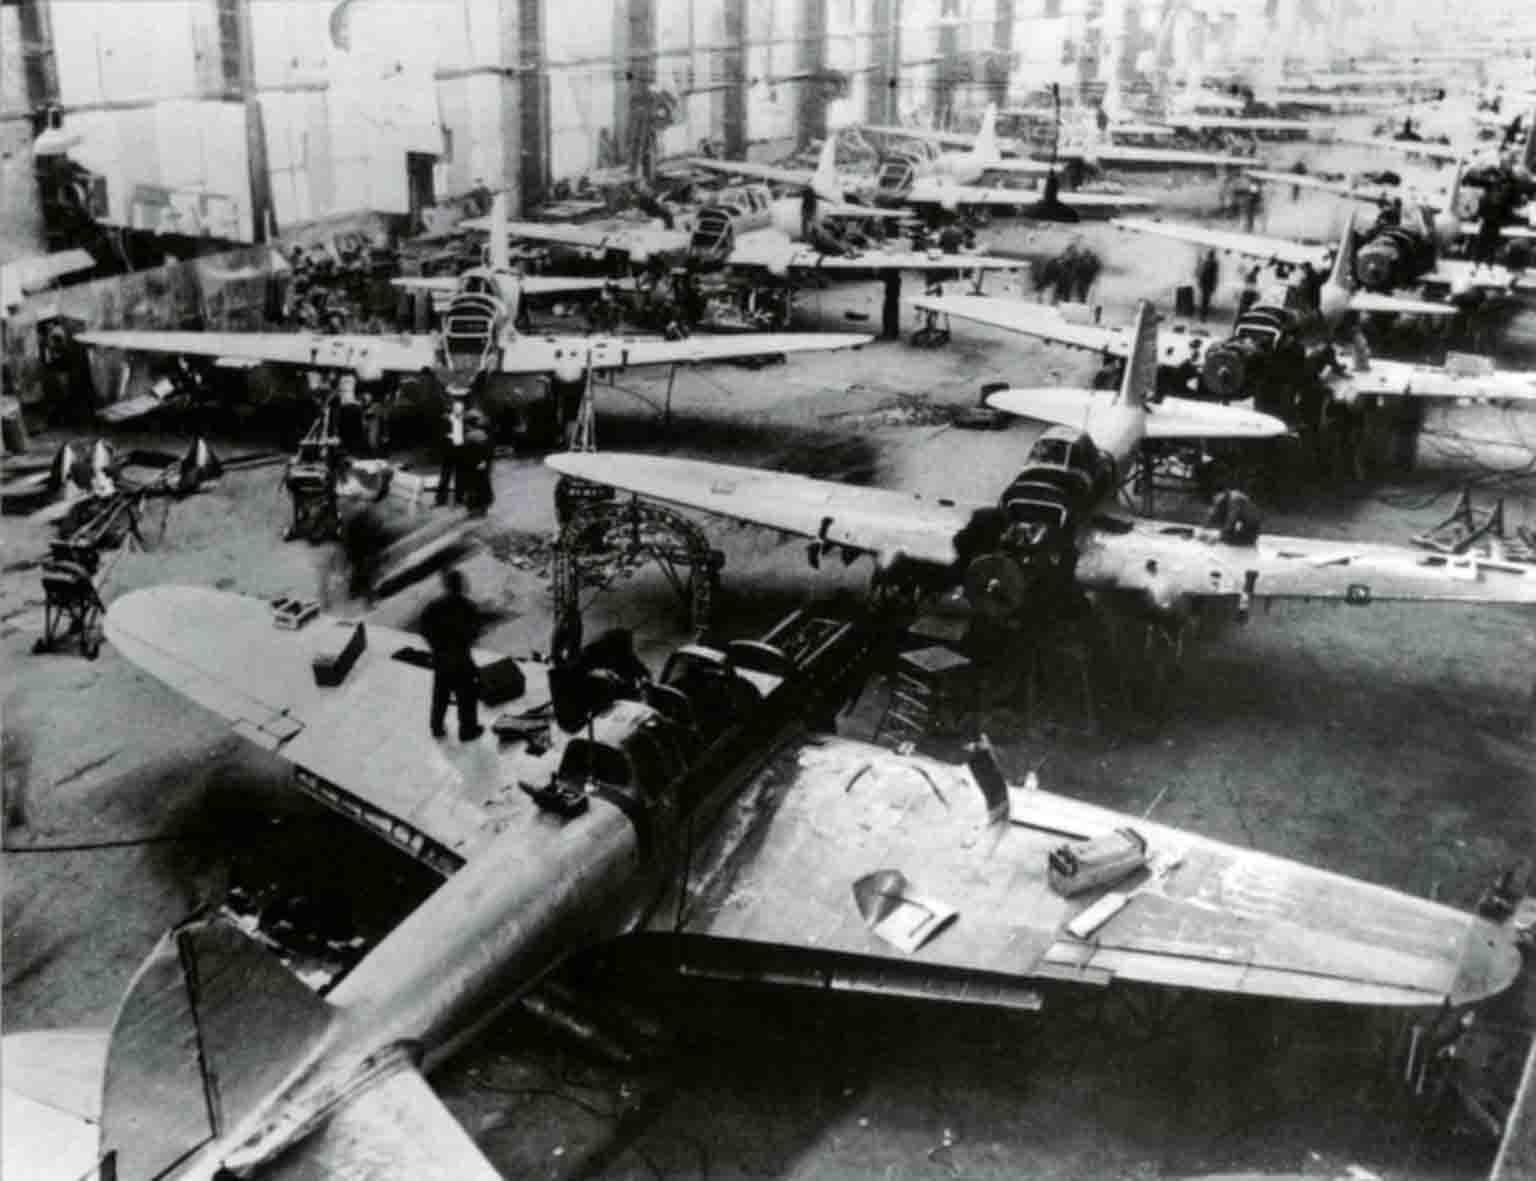 IL-2 aircraft